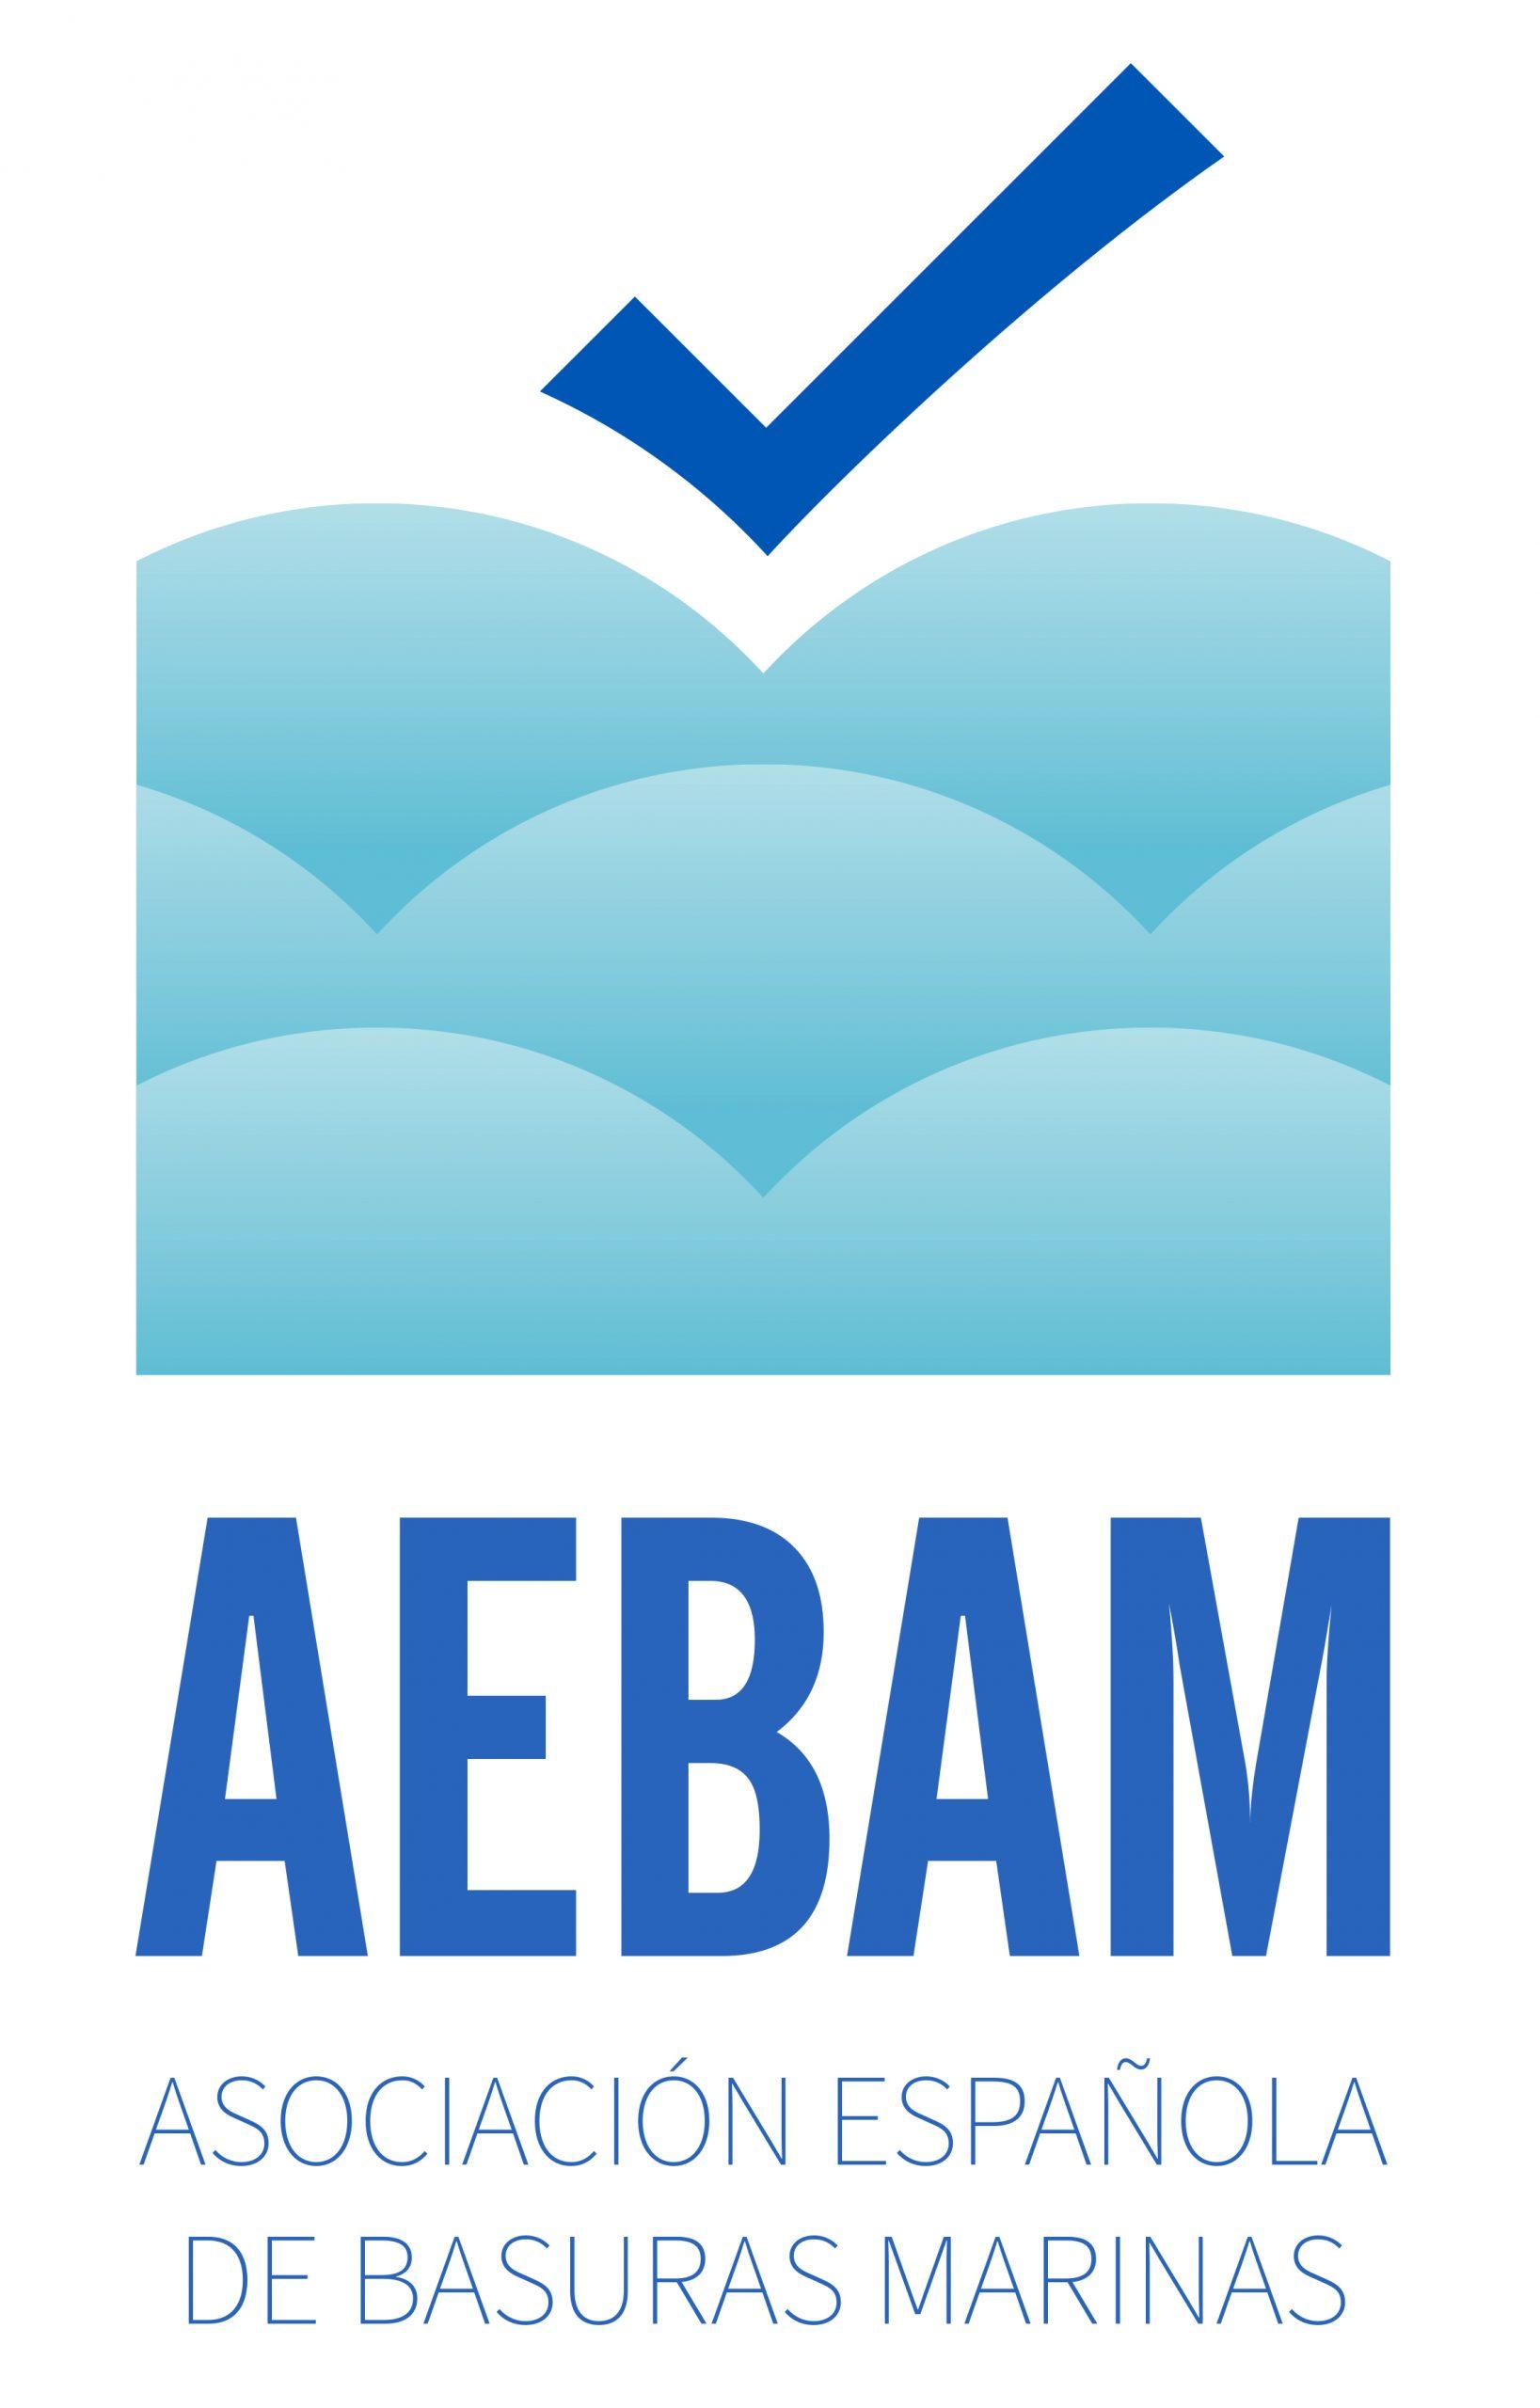 https://europeanplasticspact.org/wp-content/uploads/2021/05/aebam_logo-scaled.jpg